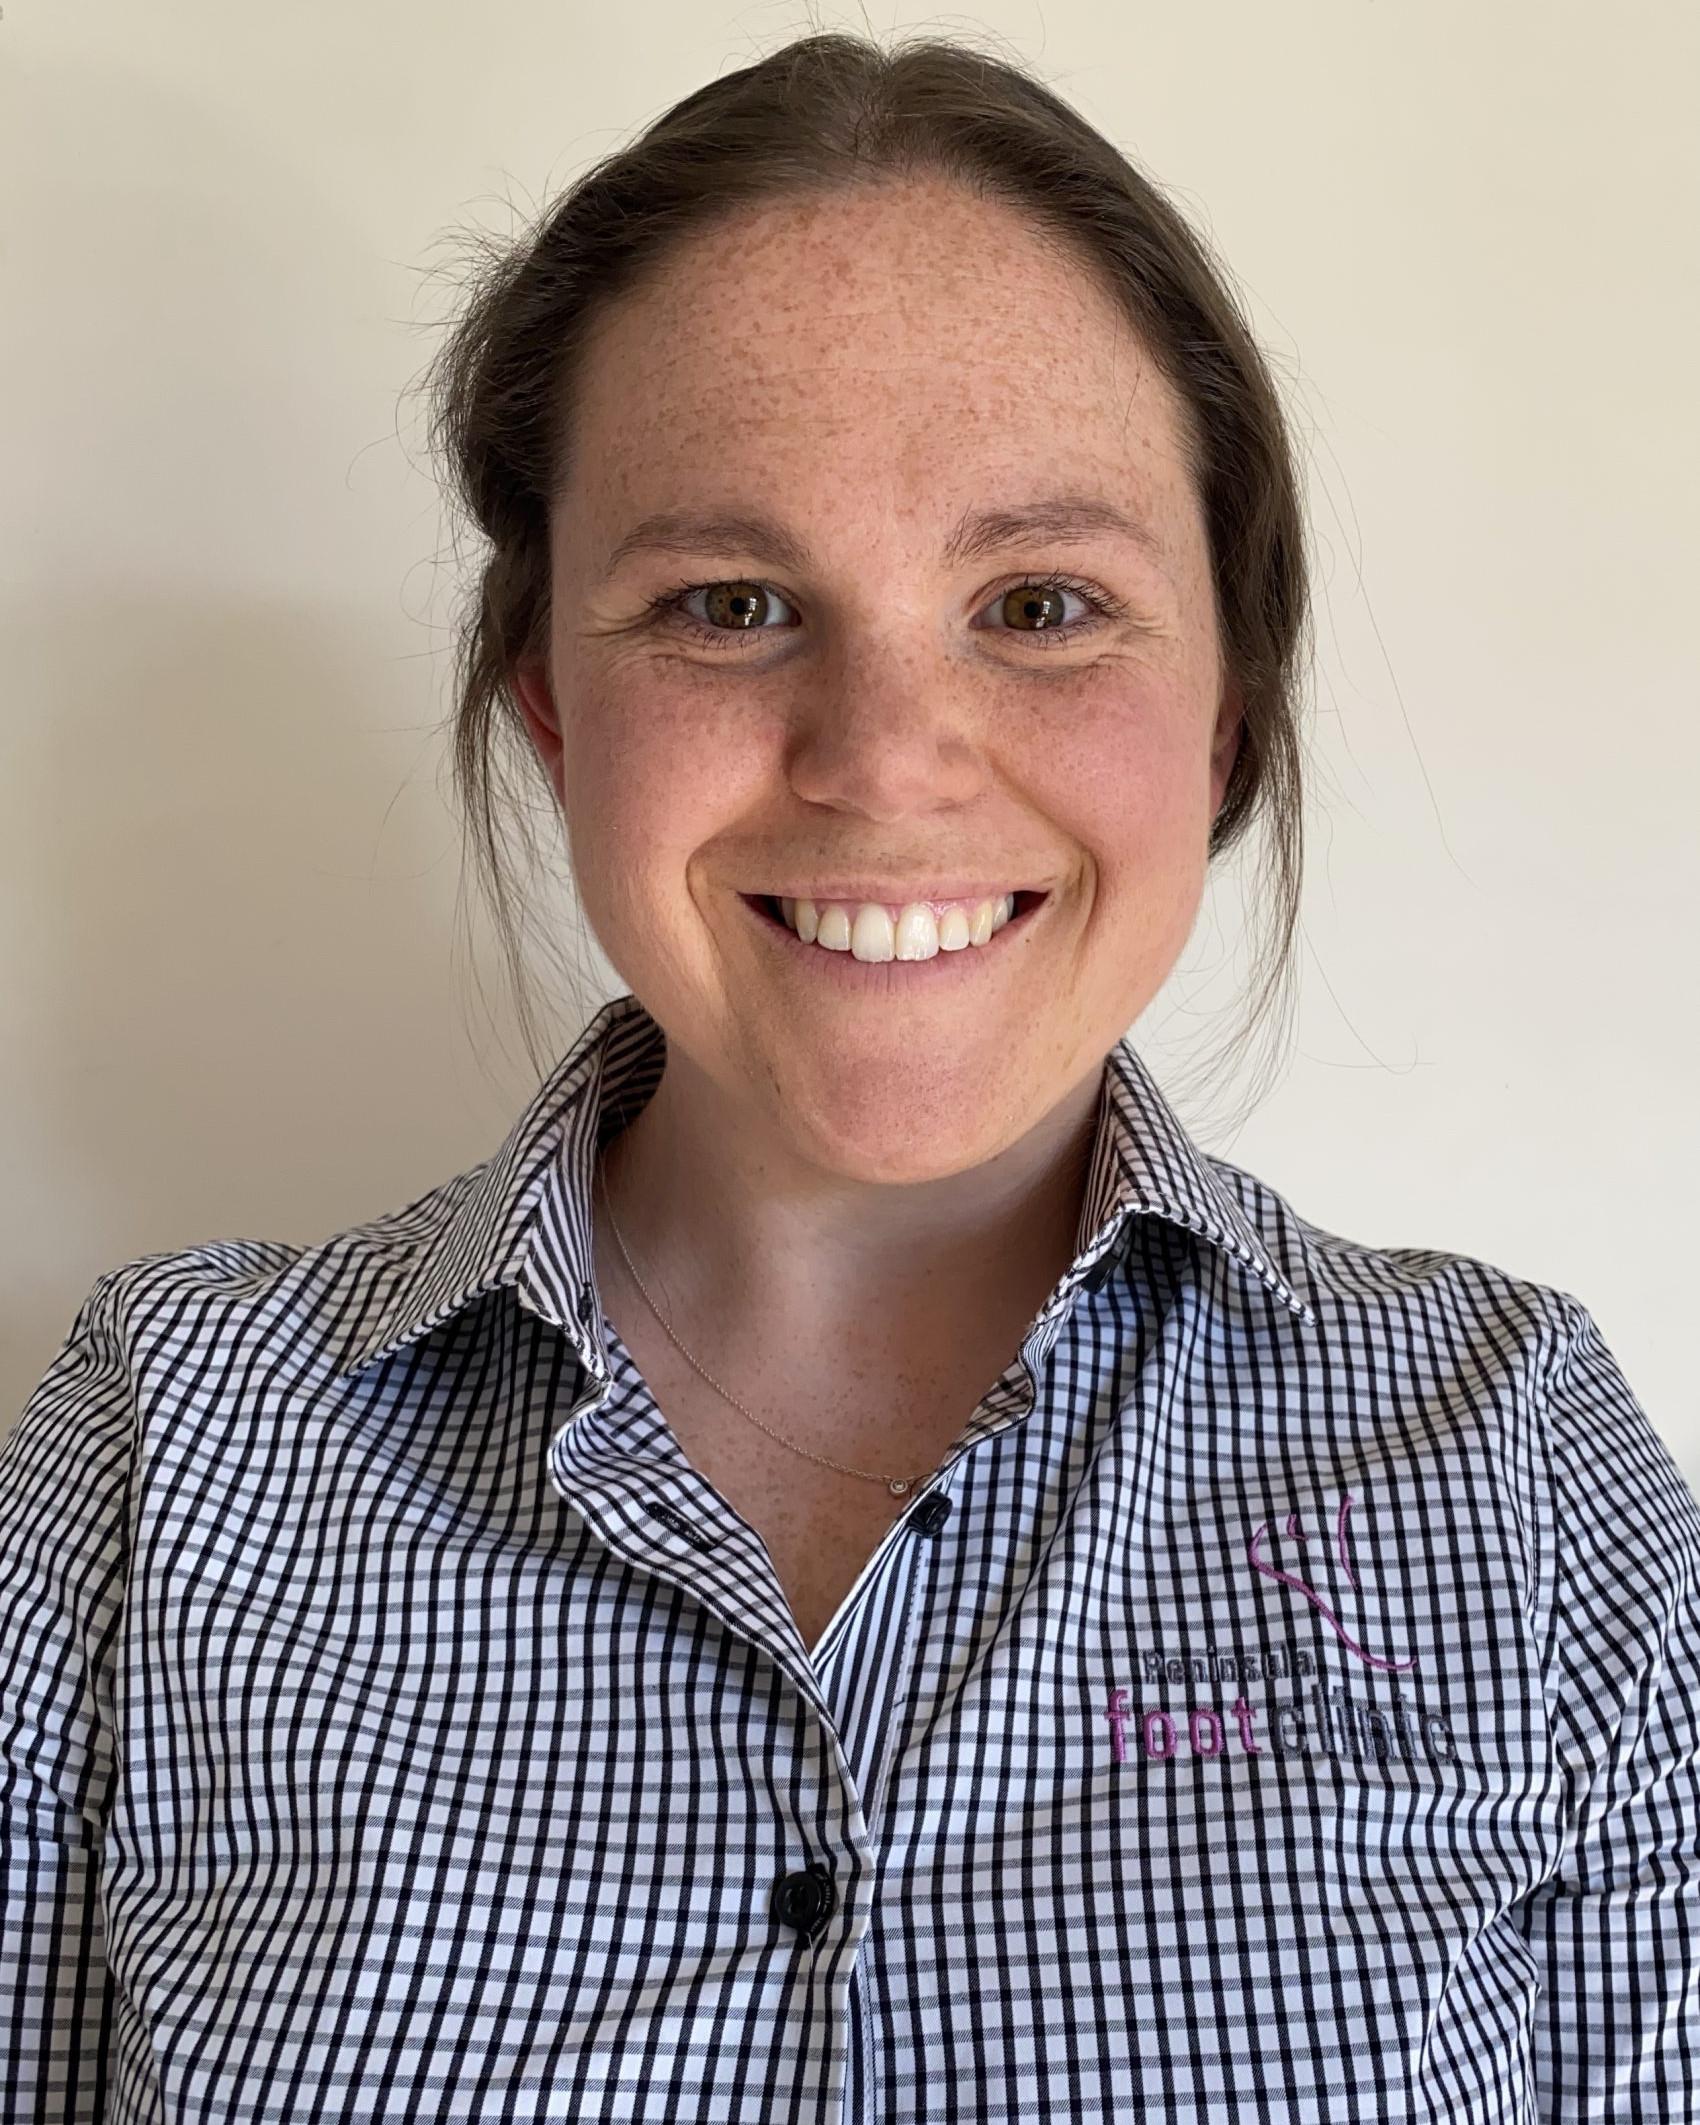 Melanie Adams Podiatrist at Peninsula Foot Clinic Rosebud and Dromana